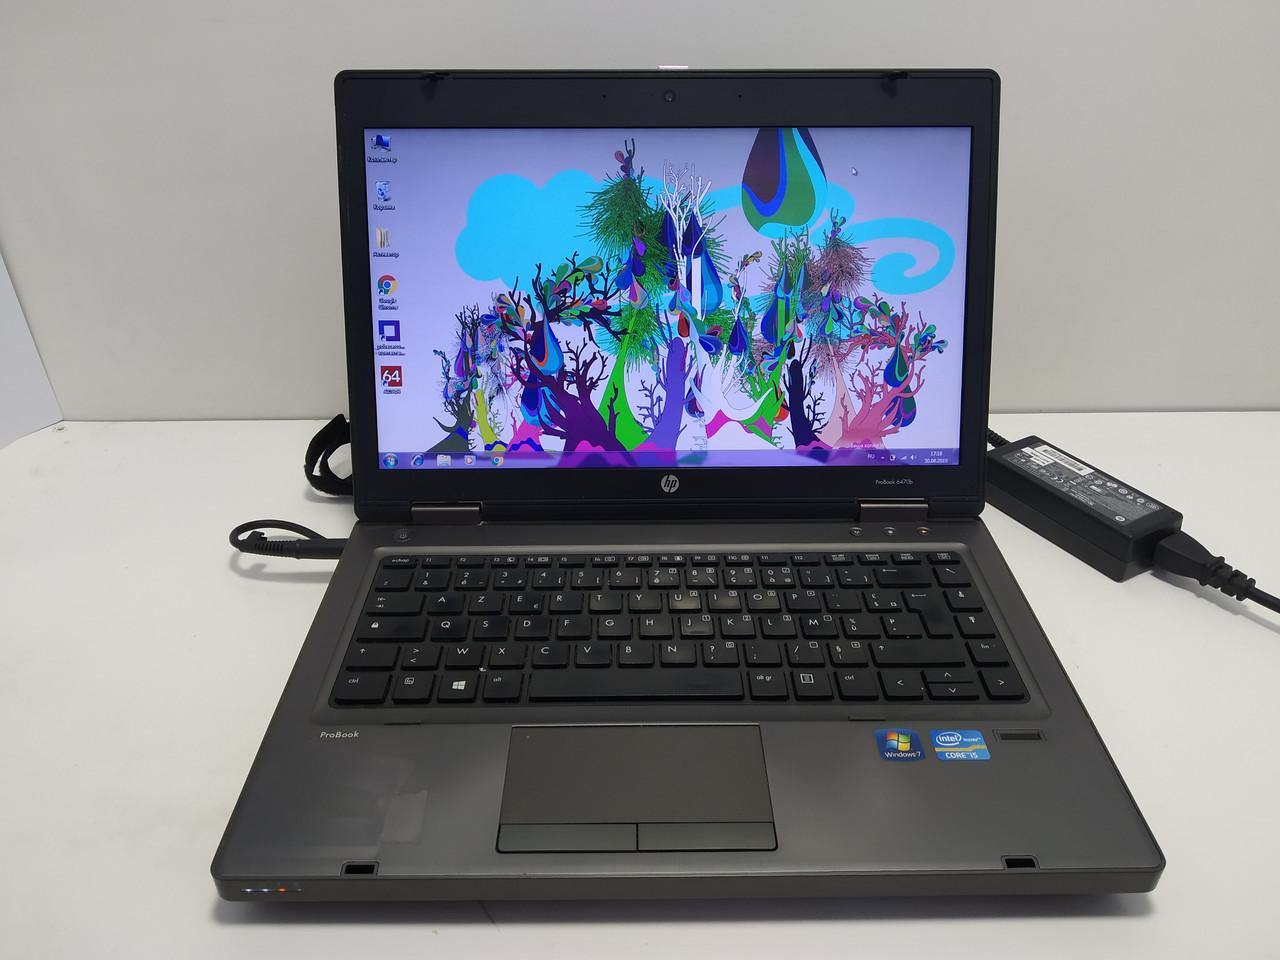 "14"" HP ProBook 6470b Intel Core i5 3320m 2.6-3.3, 4 ГБ DDR3,  новый 120 ГБ SSD, АКБ до 5 ч. Полностью настроен"